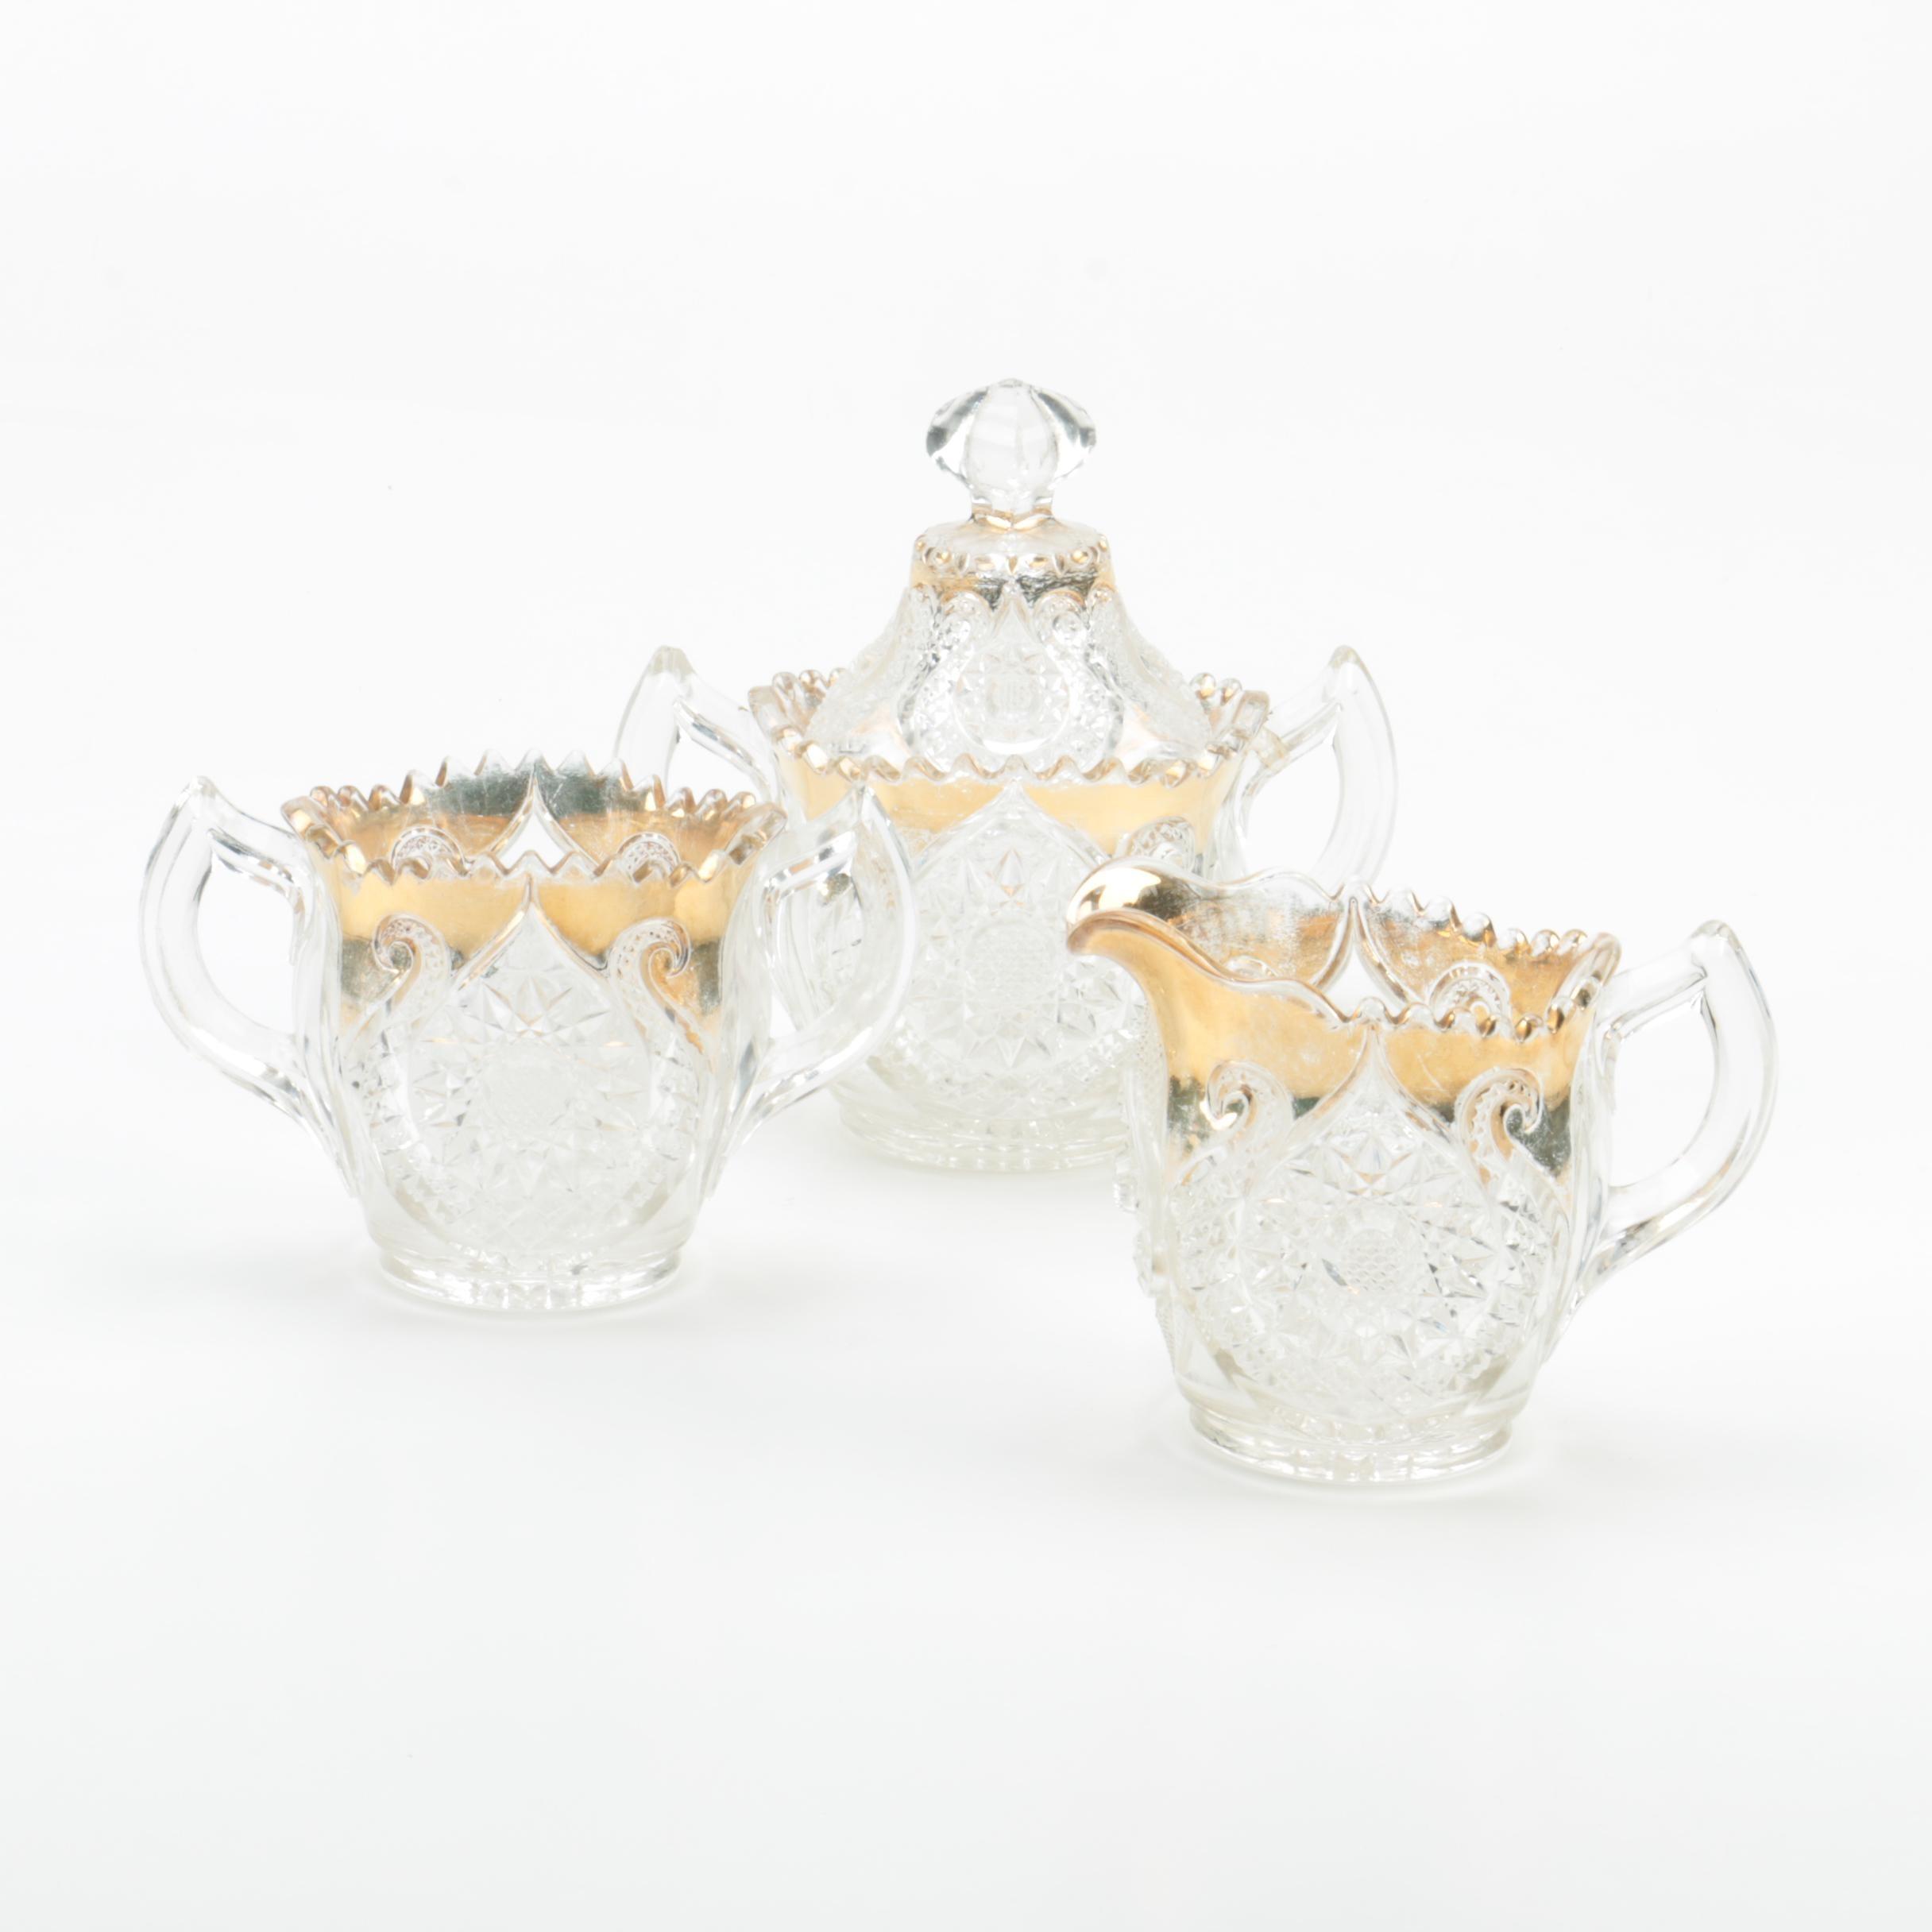 Vintage Pressed and Gilt Glass Serveware